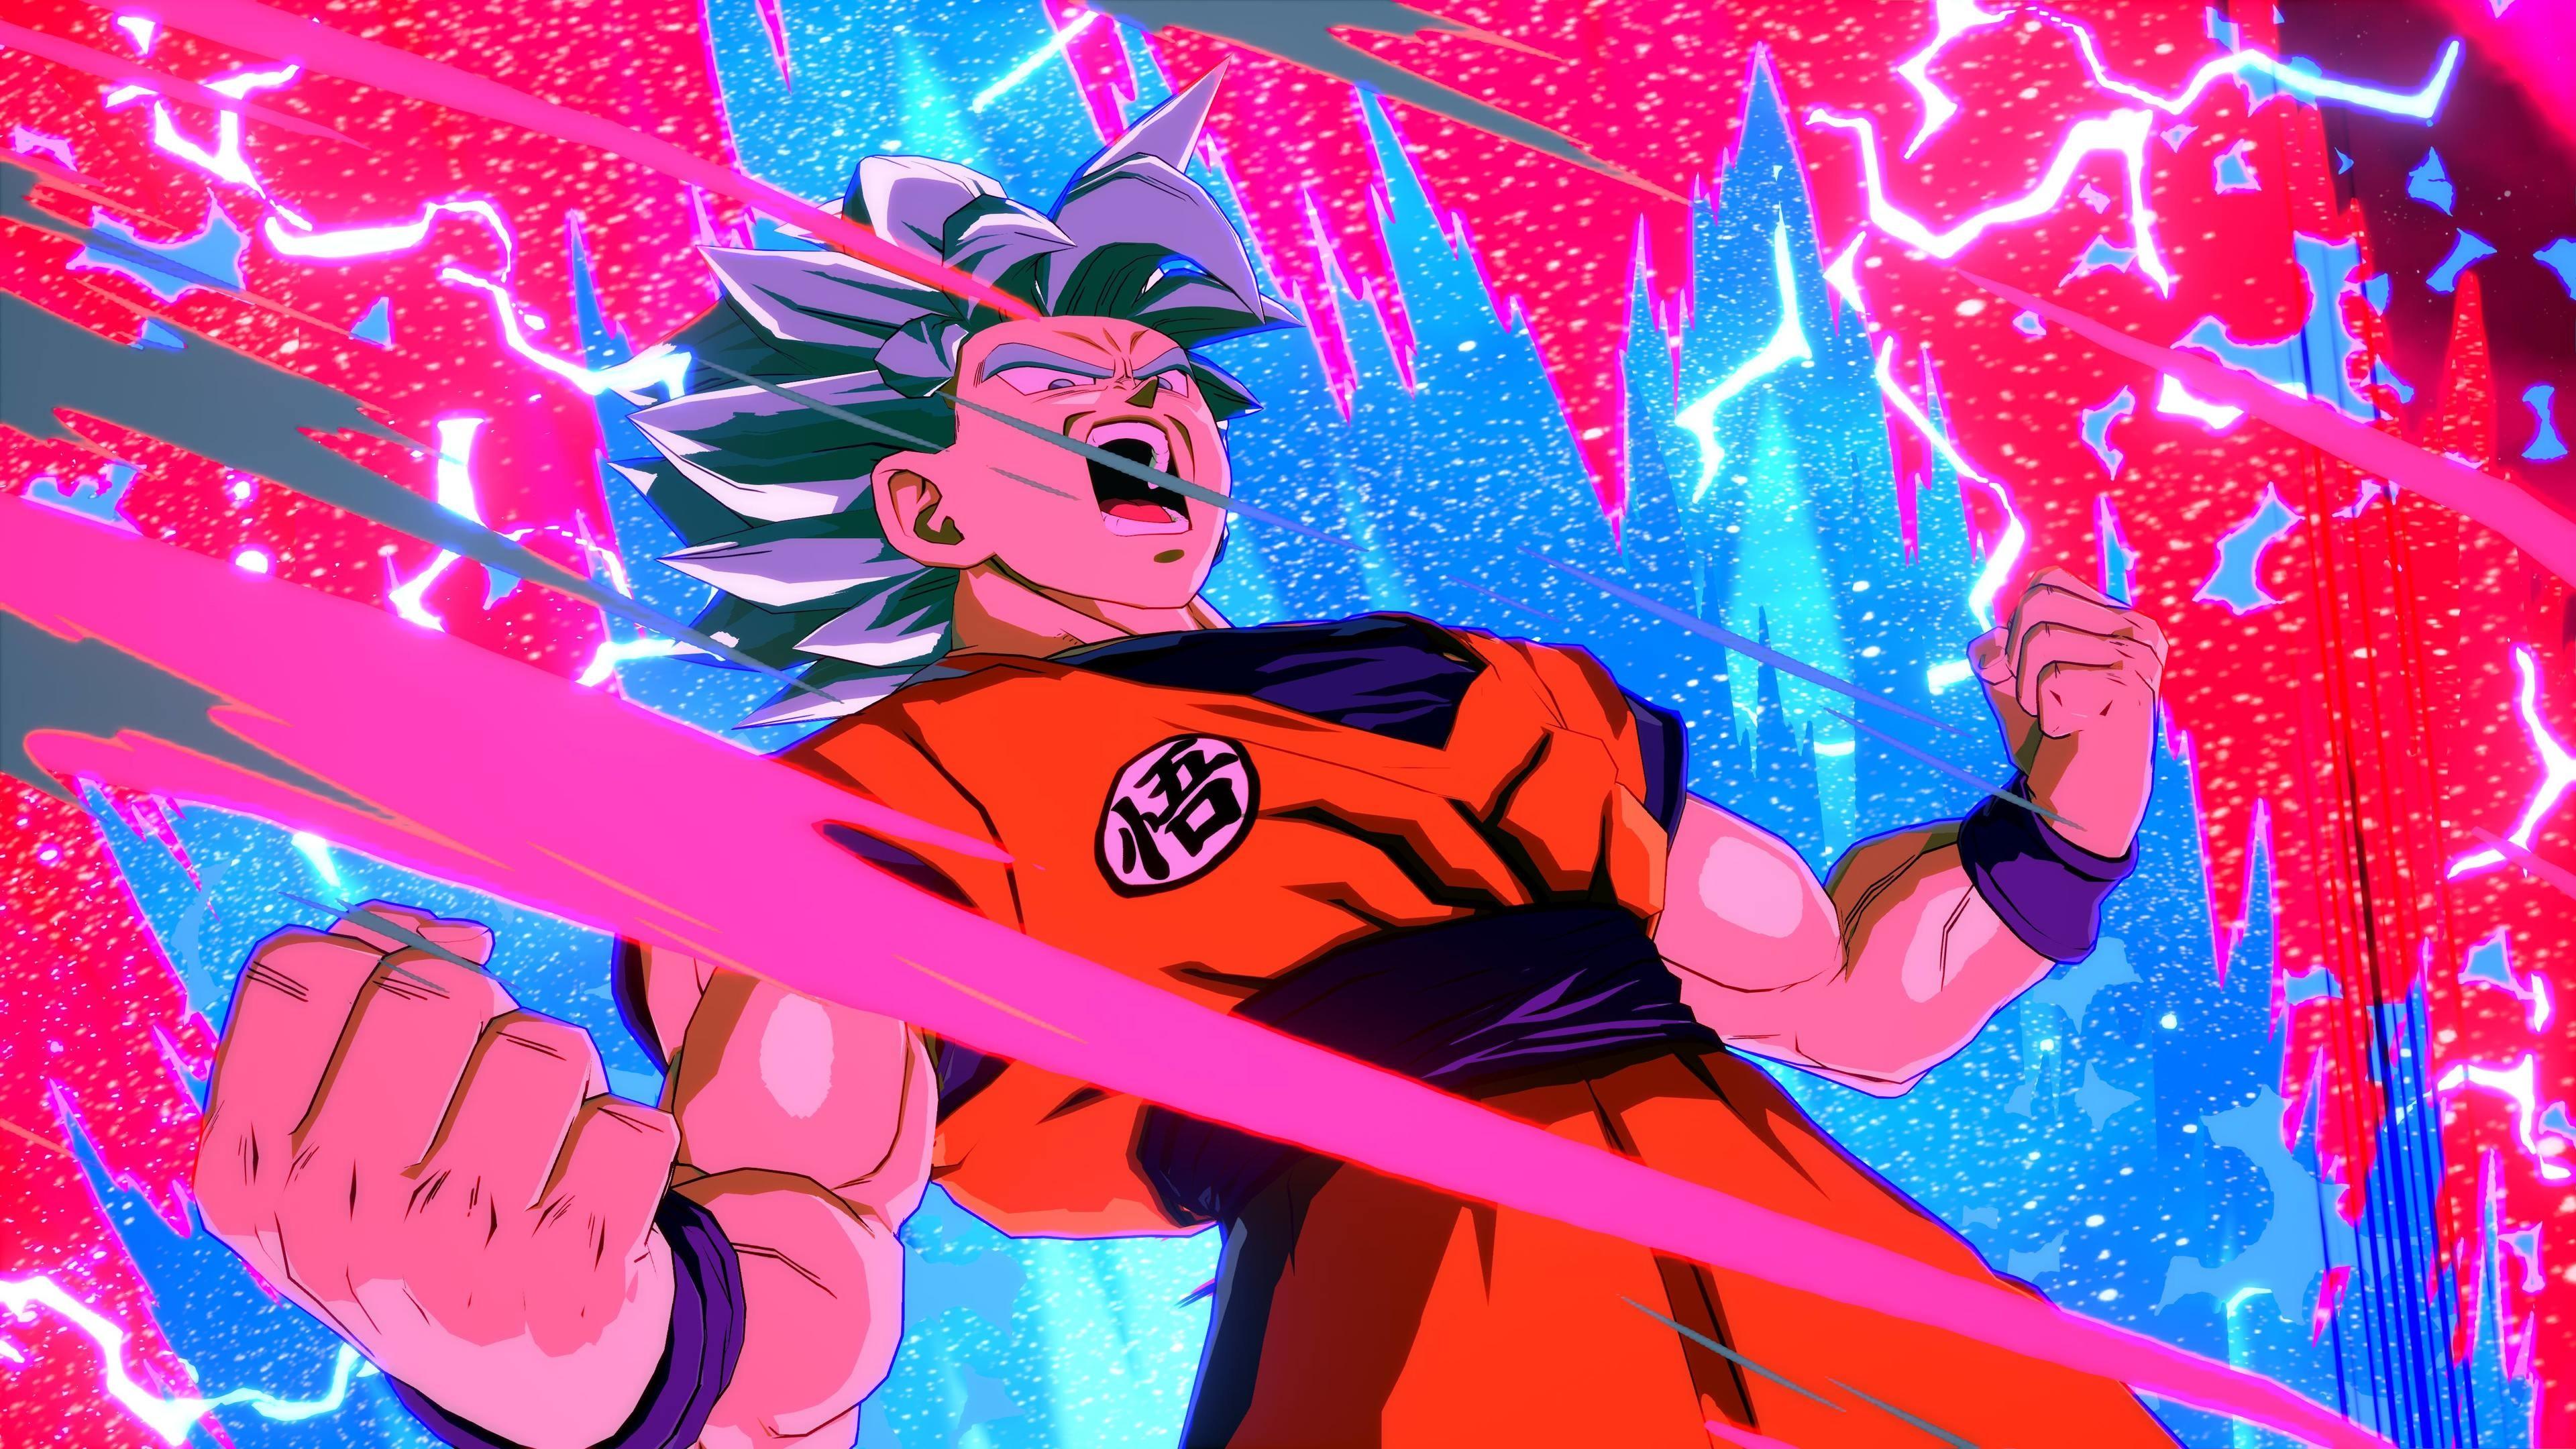 Goku best picture